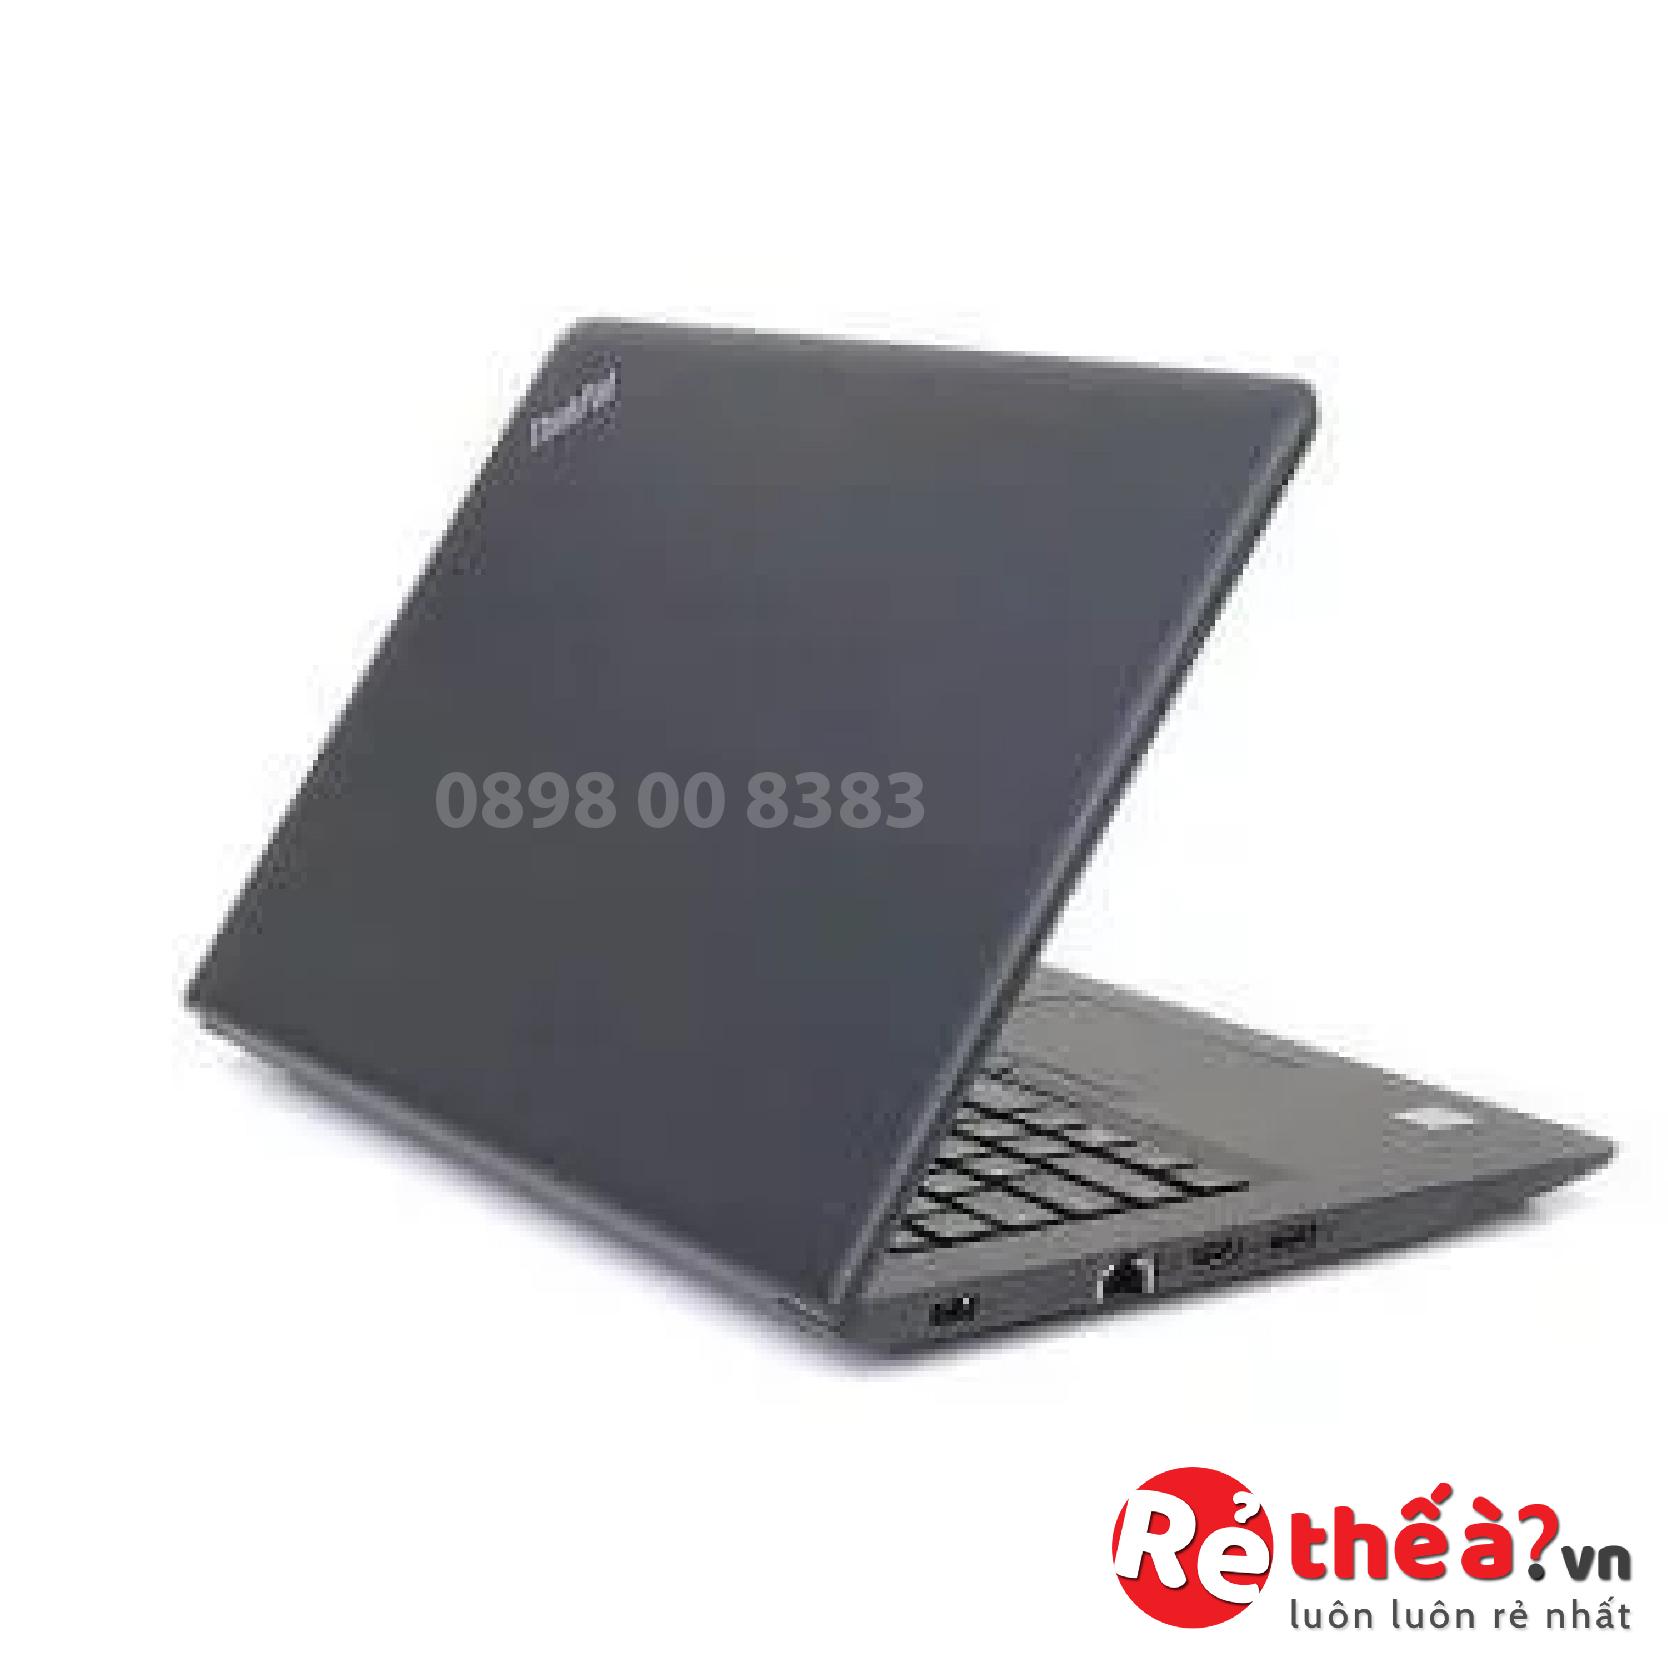 Laptop Lenovo Thinkpad E470